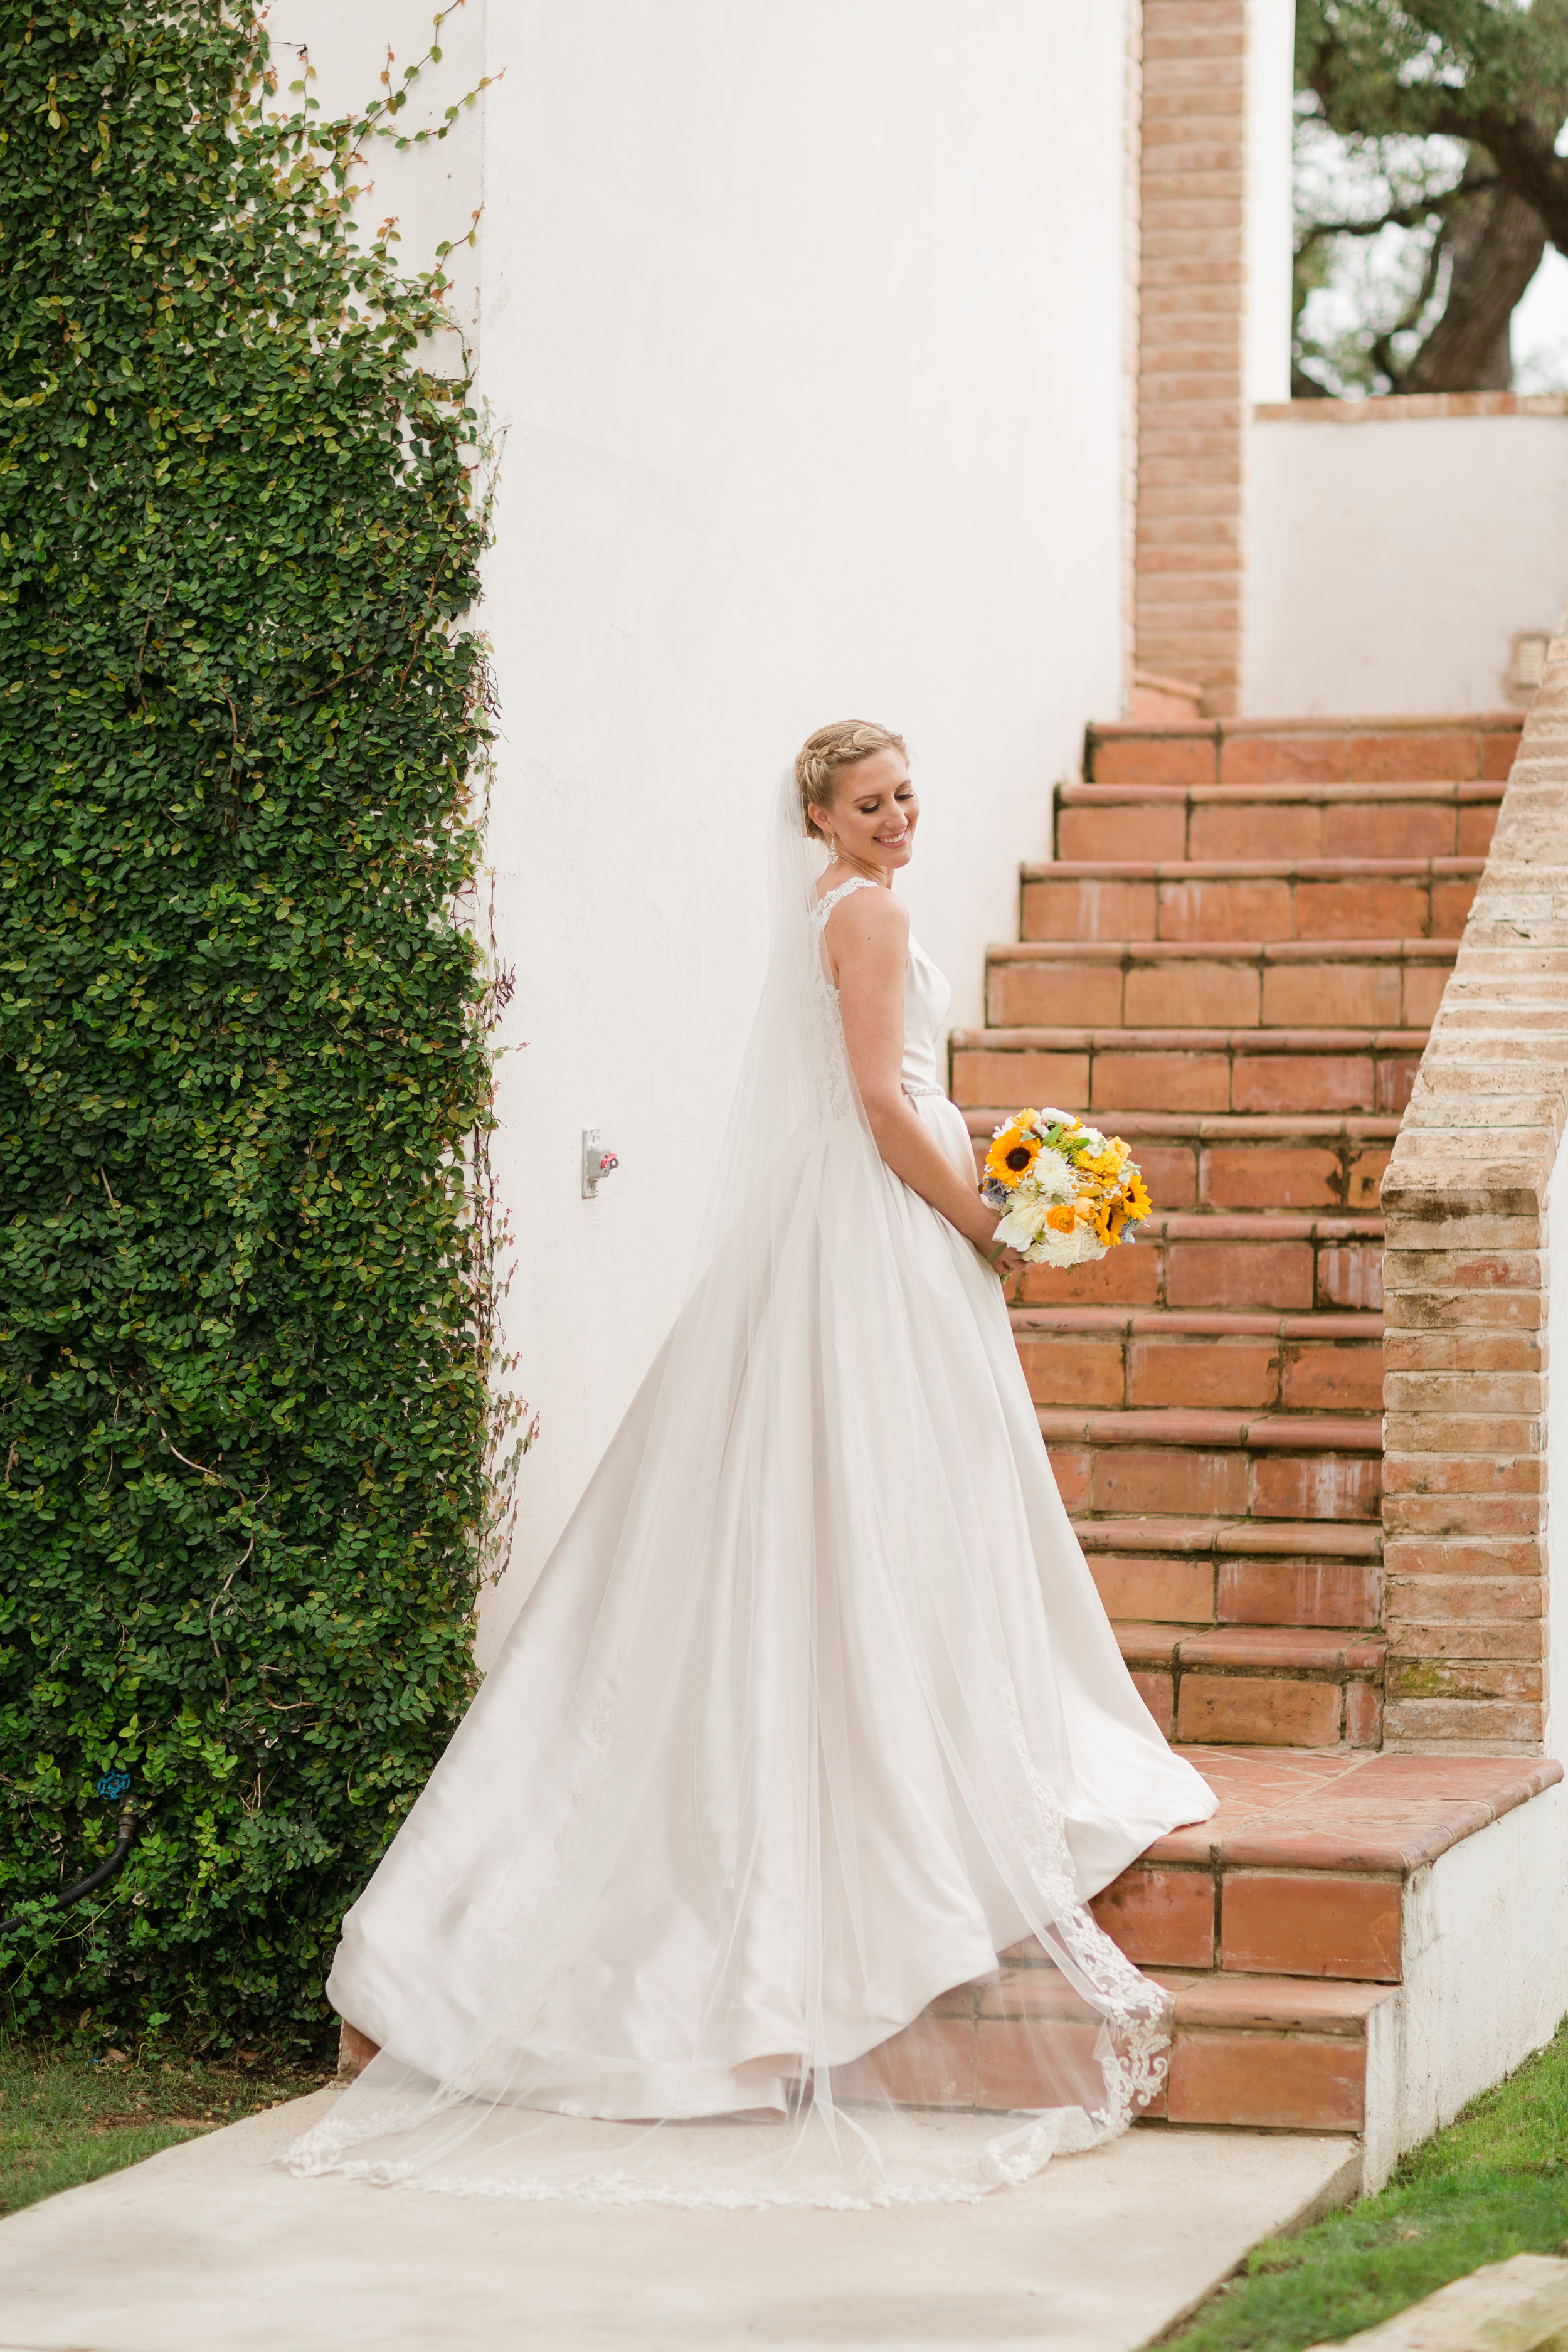 Laufs-Wedding-576.jpg